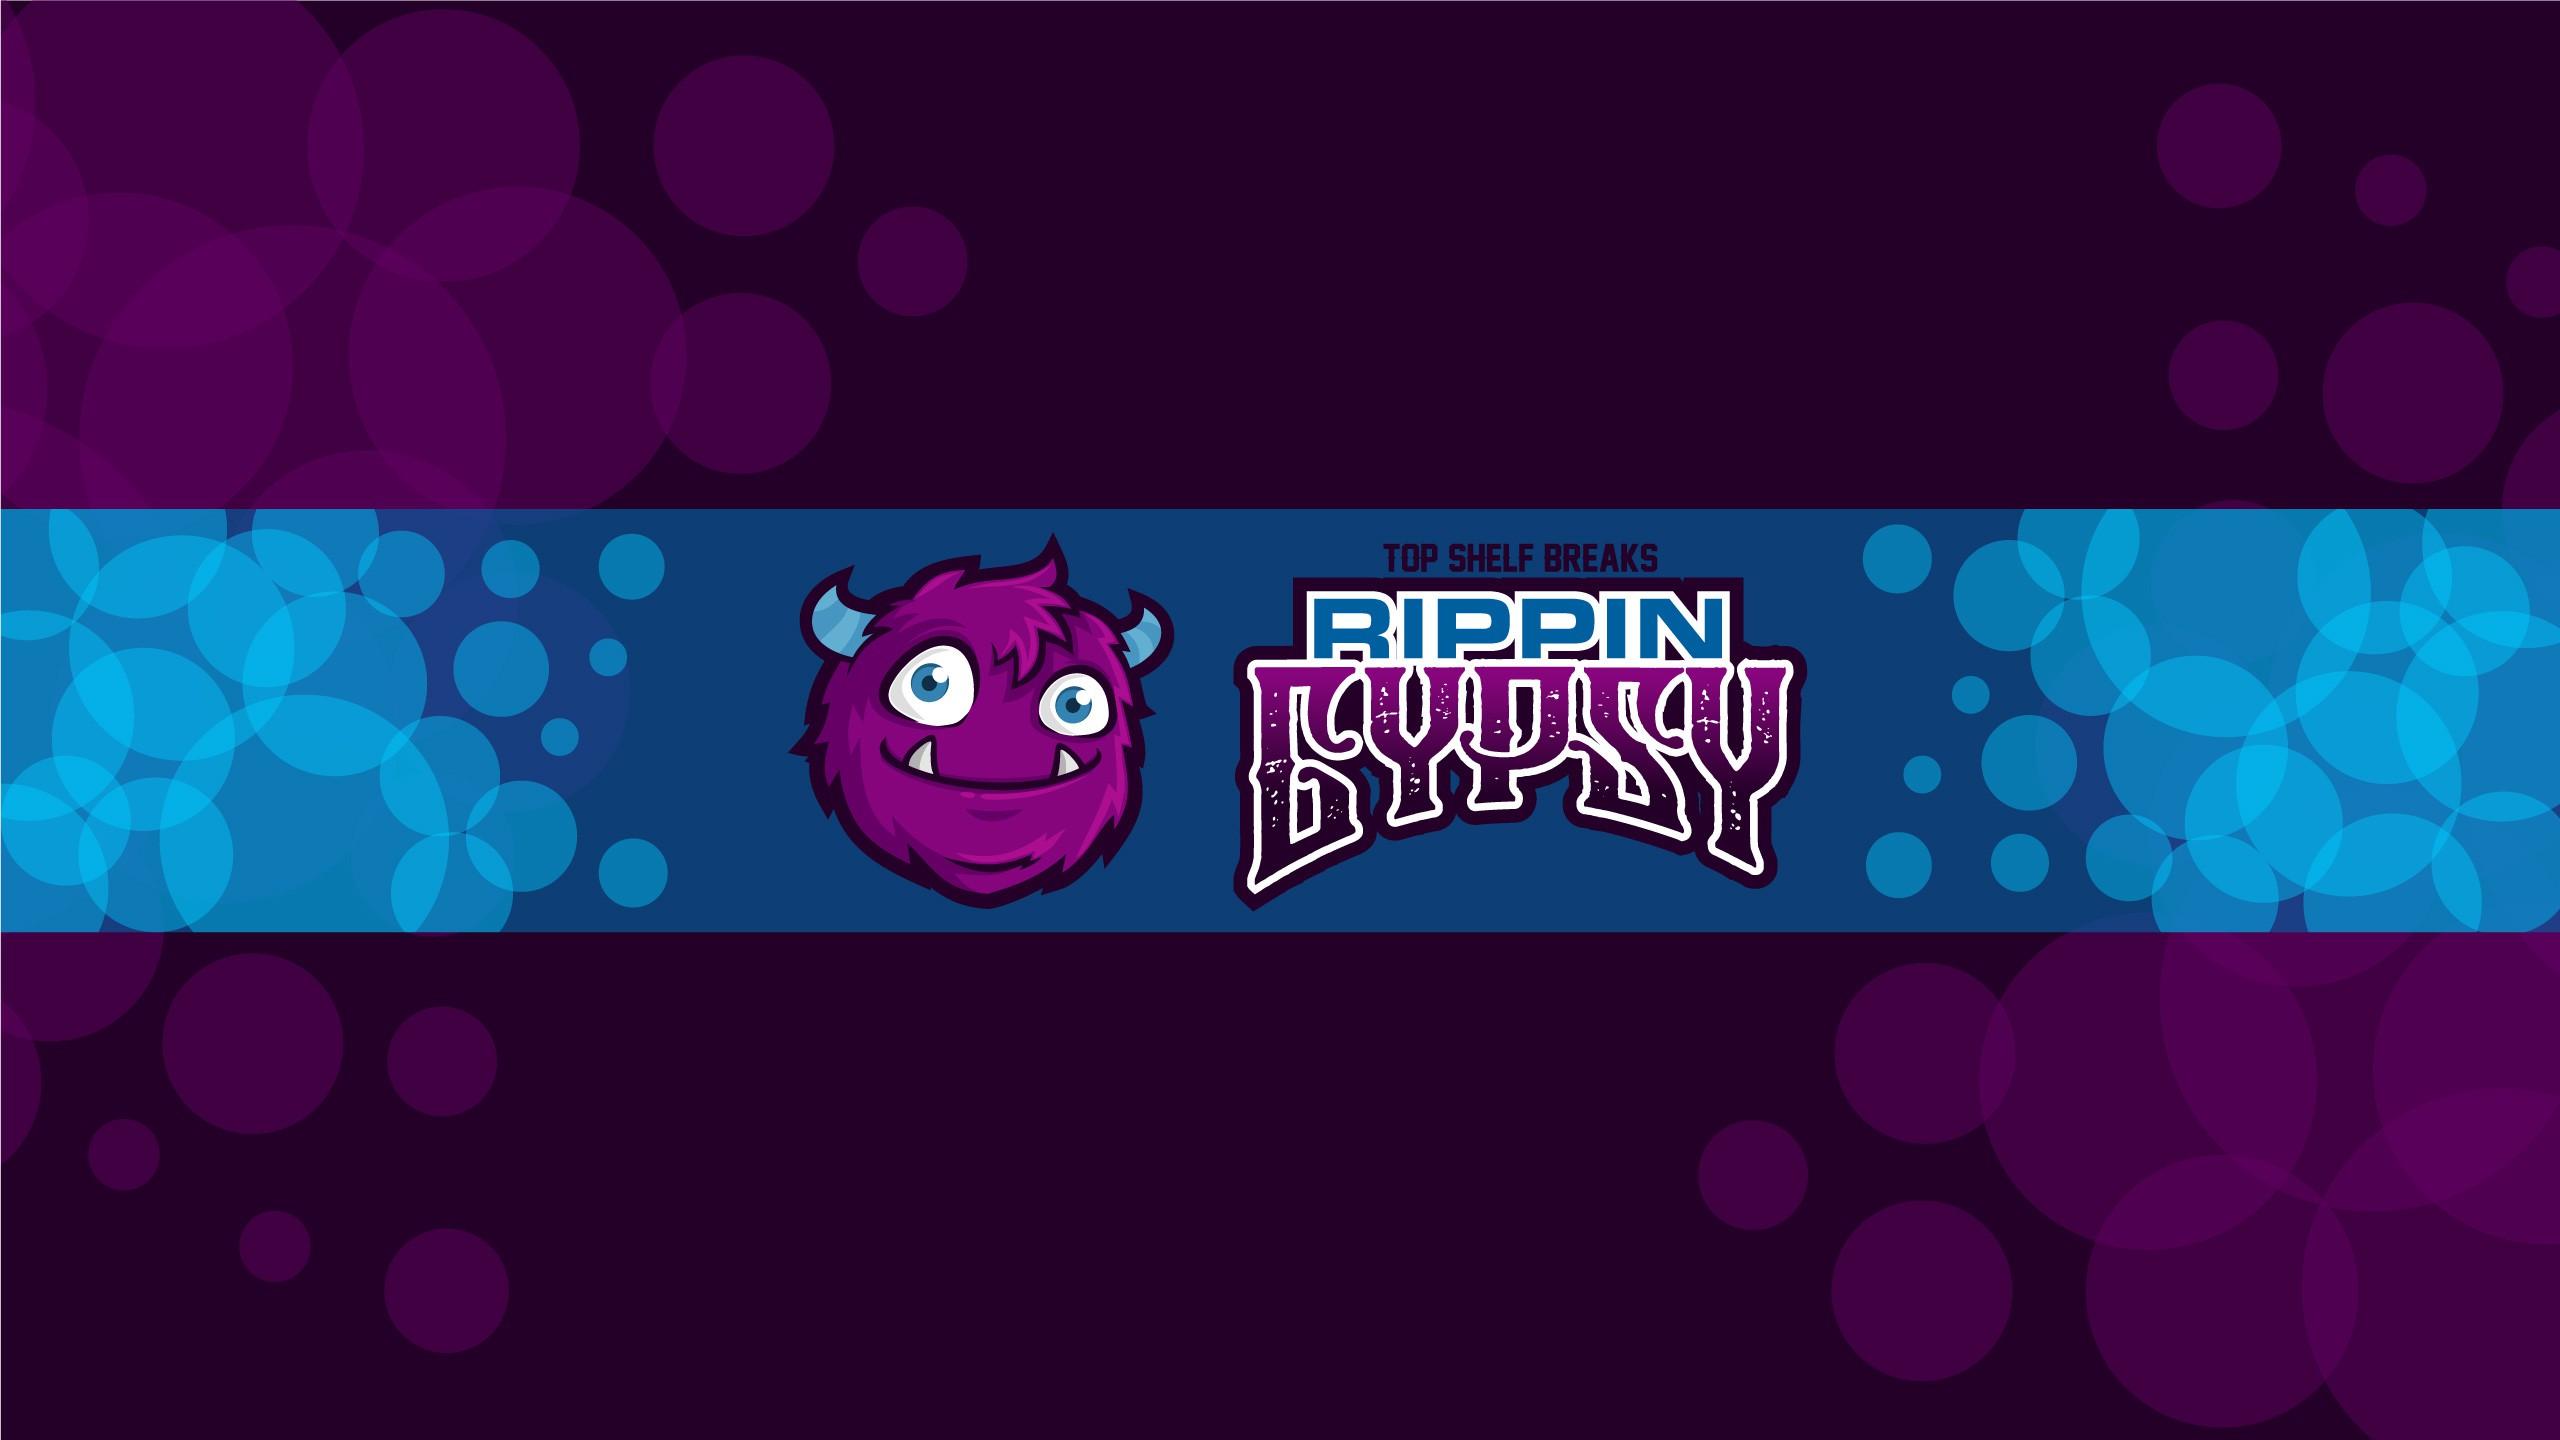 New logo for Rippin Gypsy